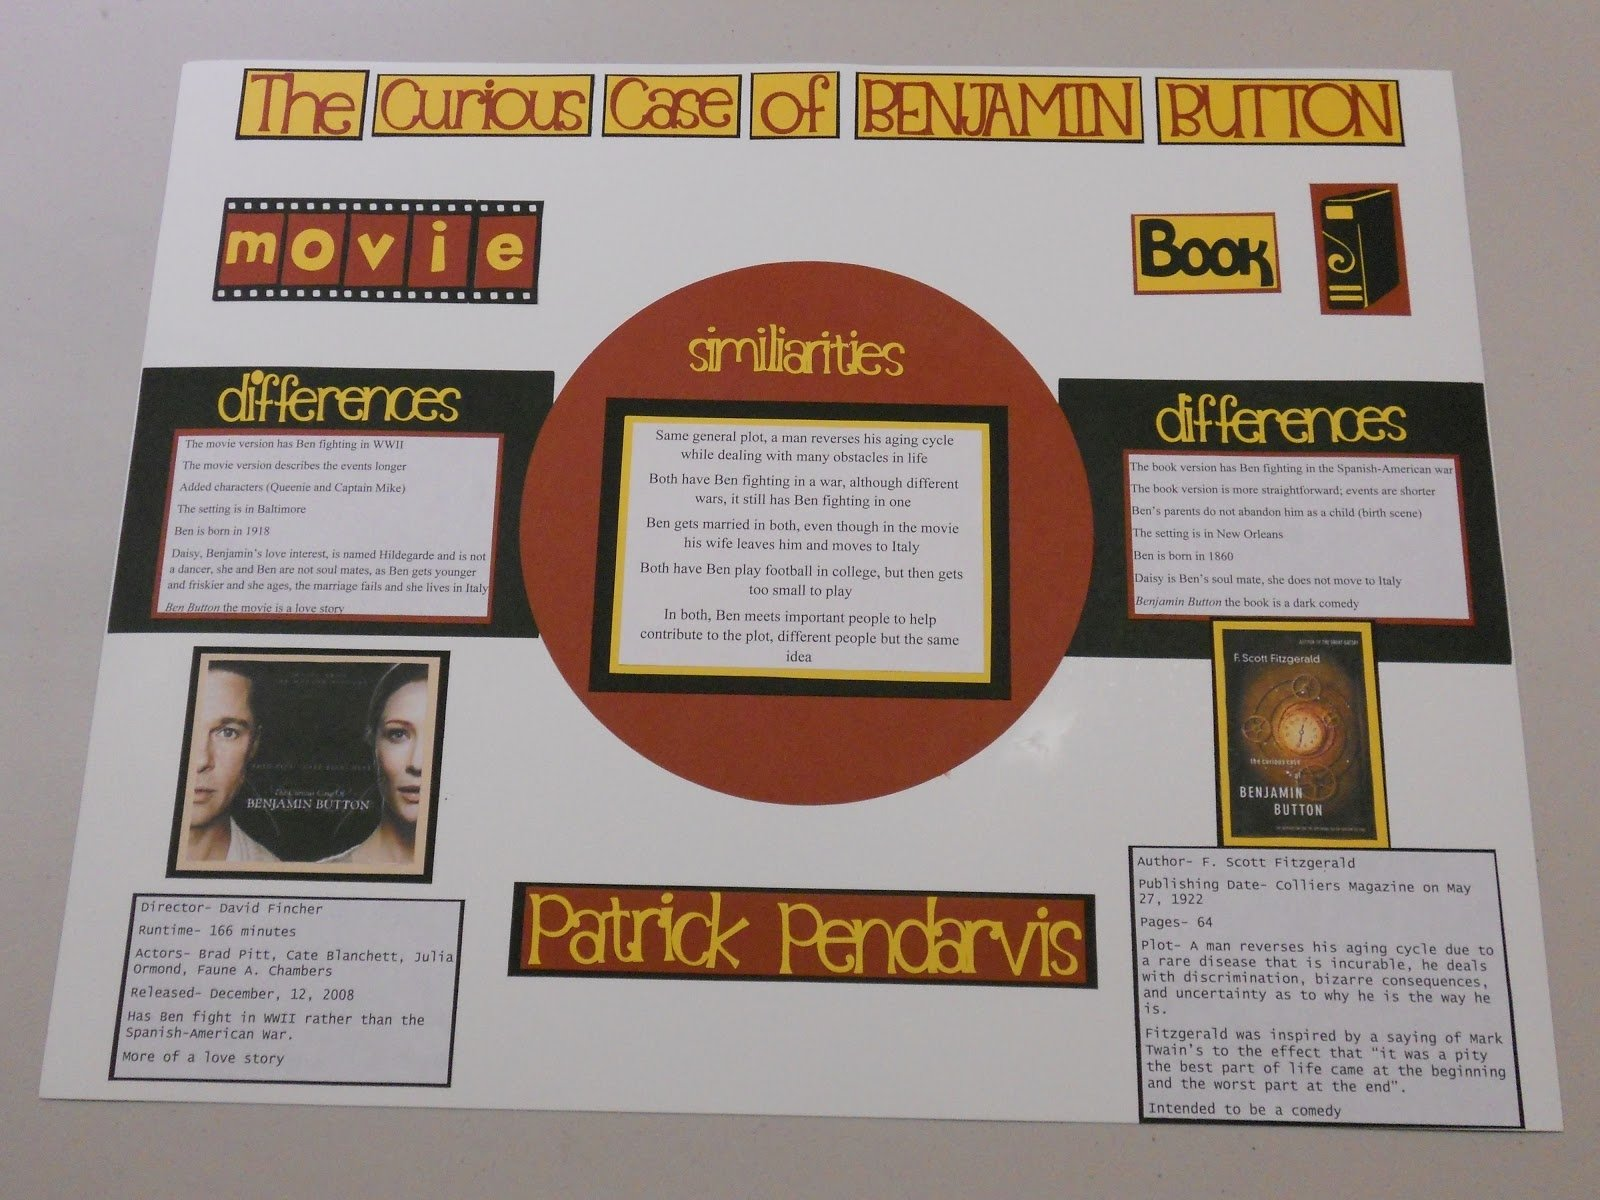 10 Best Poster Board Ideas For School Projects school poster projects daway dabrowa co 2020